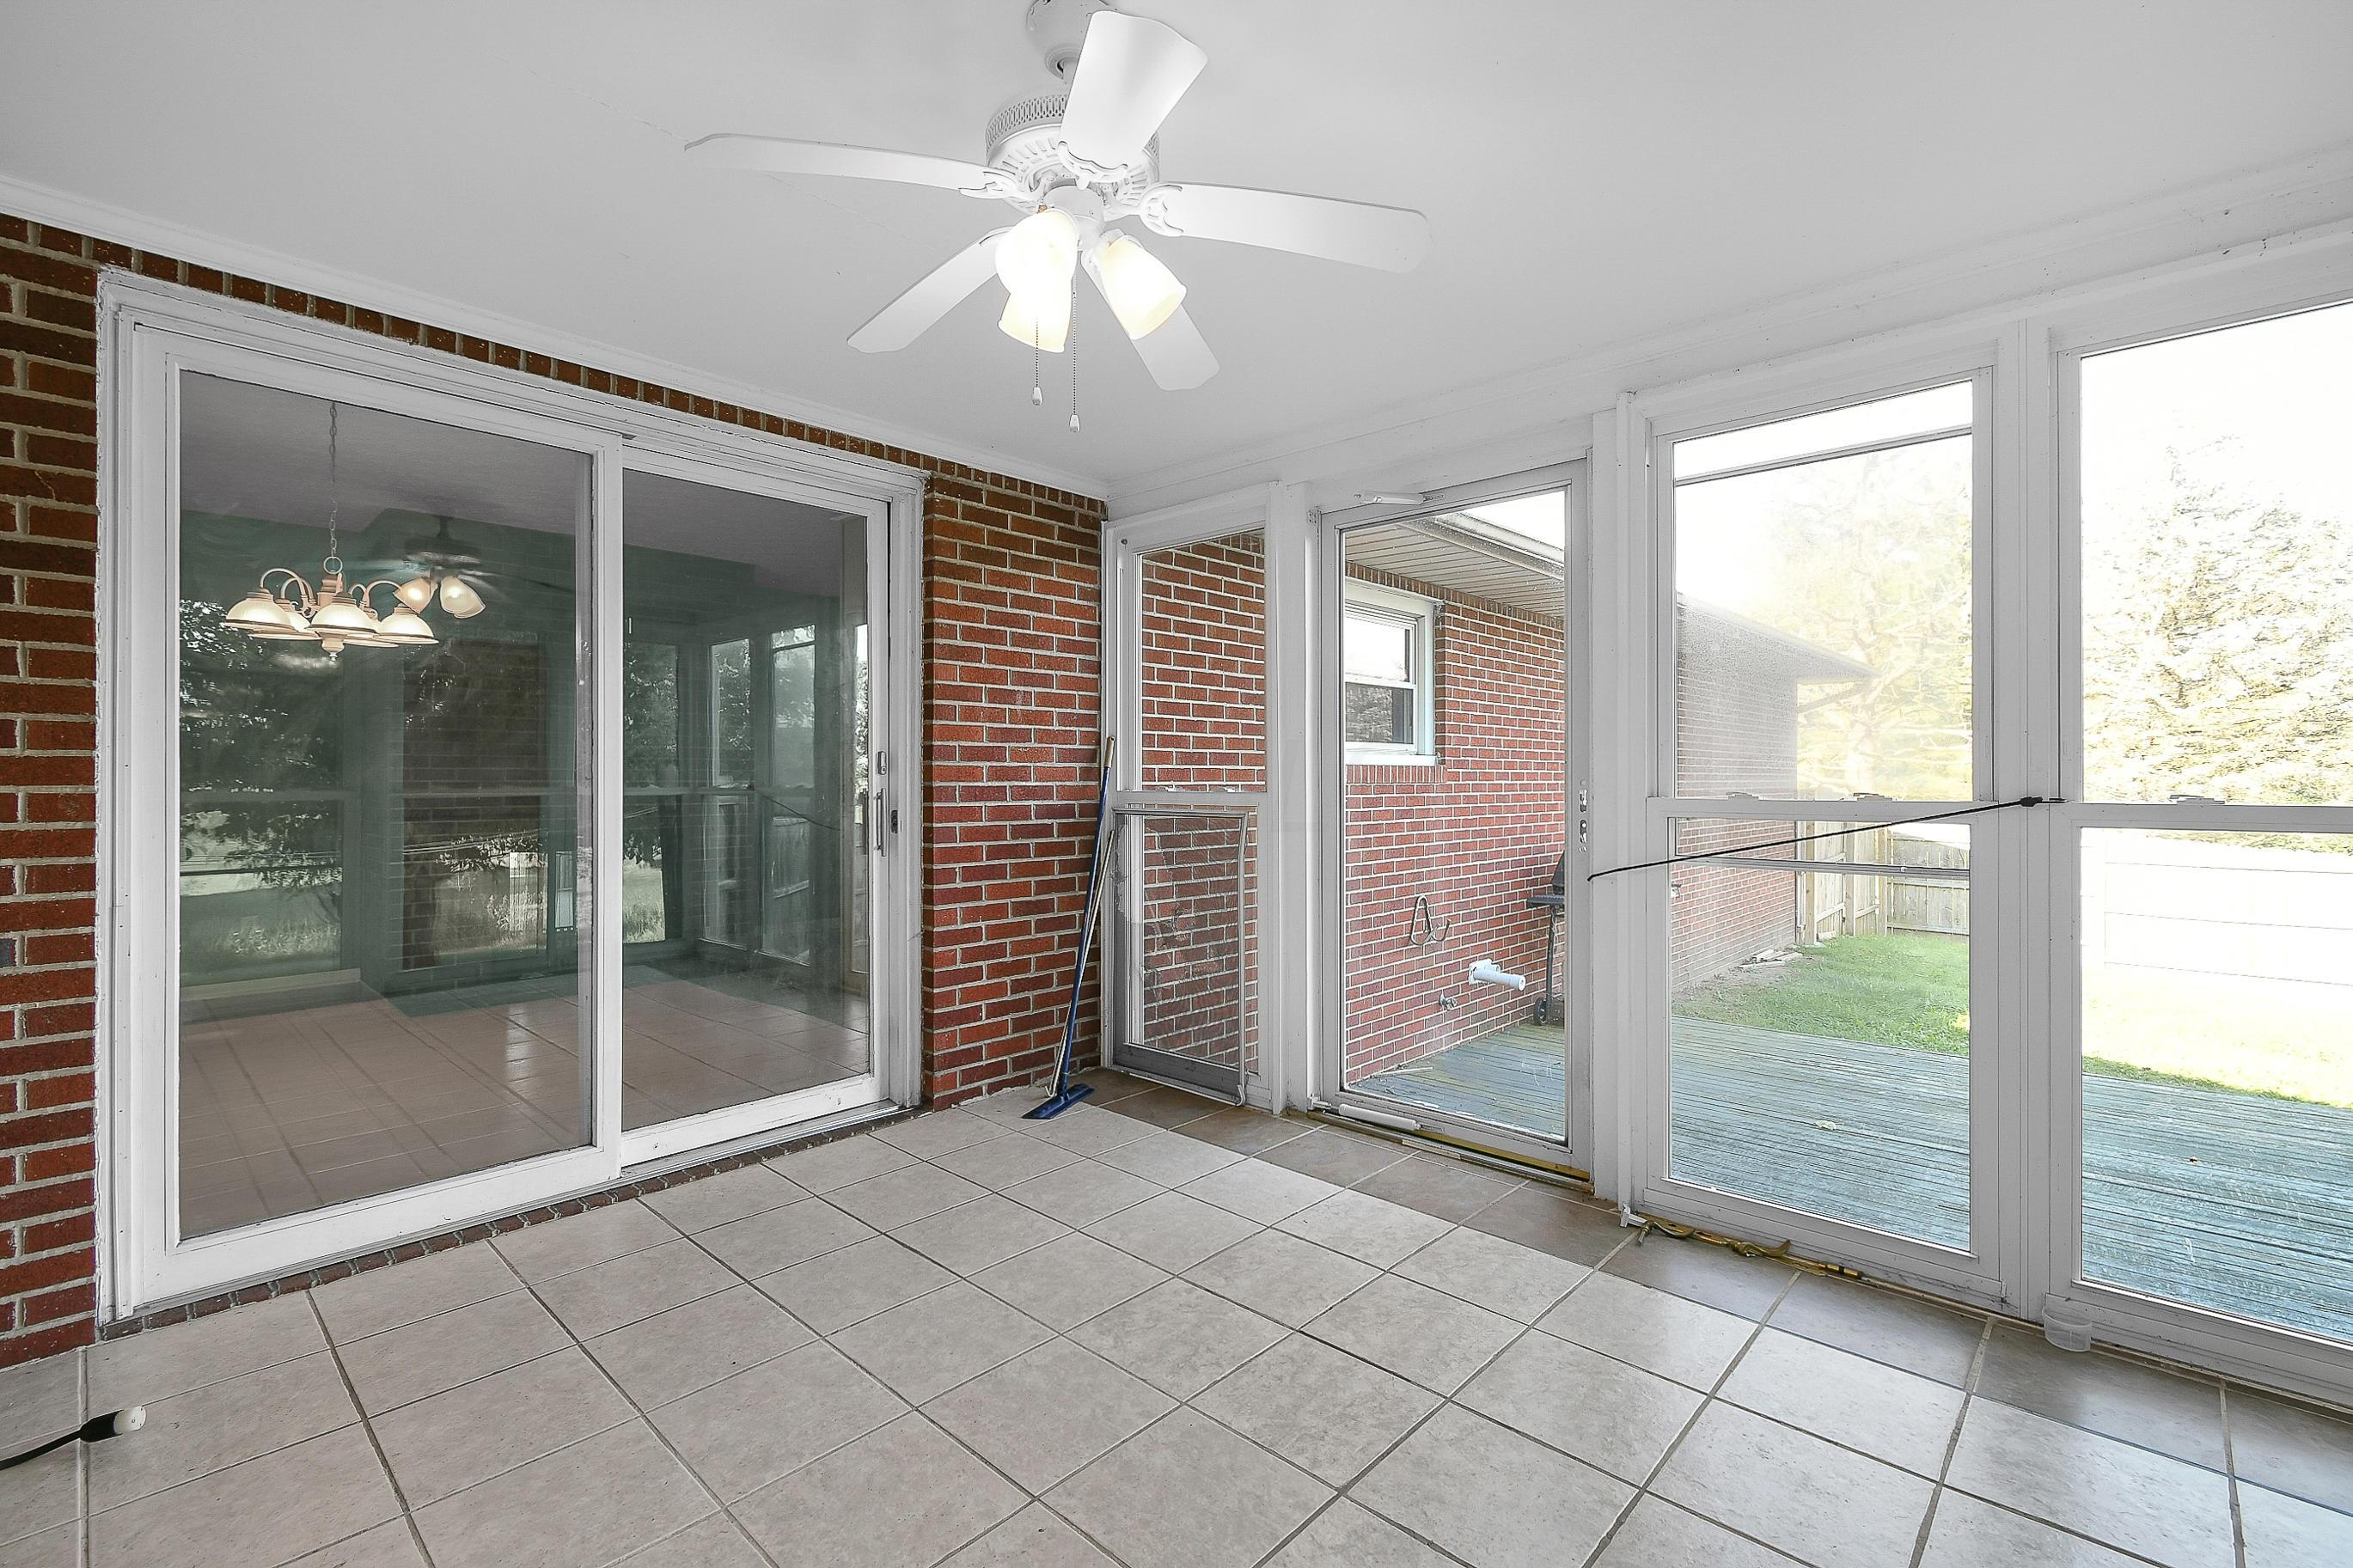 7090 Post Road, Dublin, Ohio 43016, 3 Bedrooms Bedrooms, ,2 BathroomsBathrooms,Residential,For Sale,Post,220030165